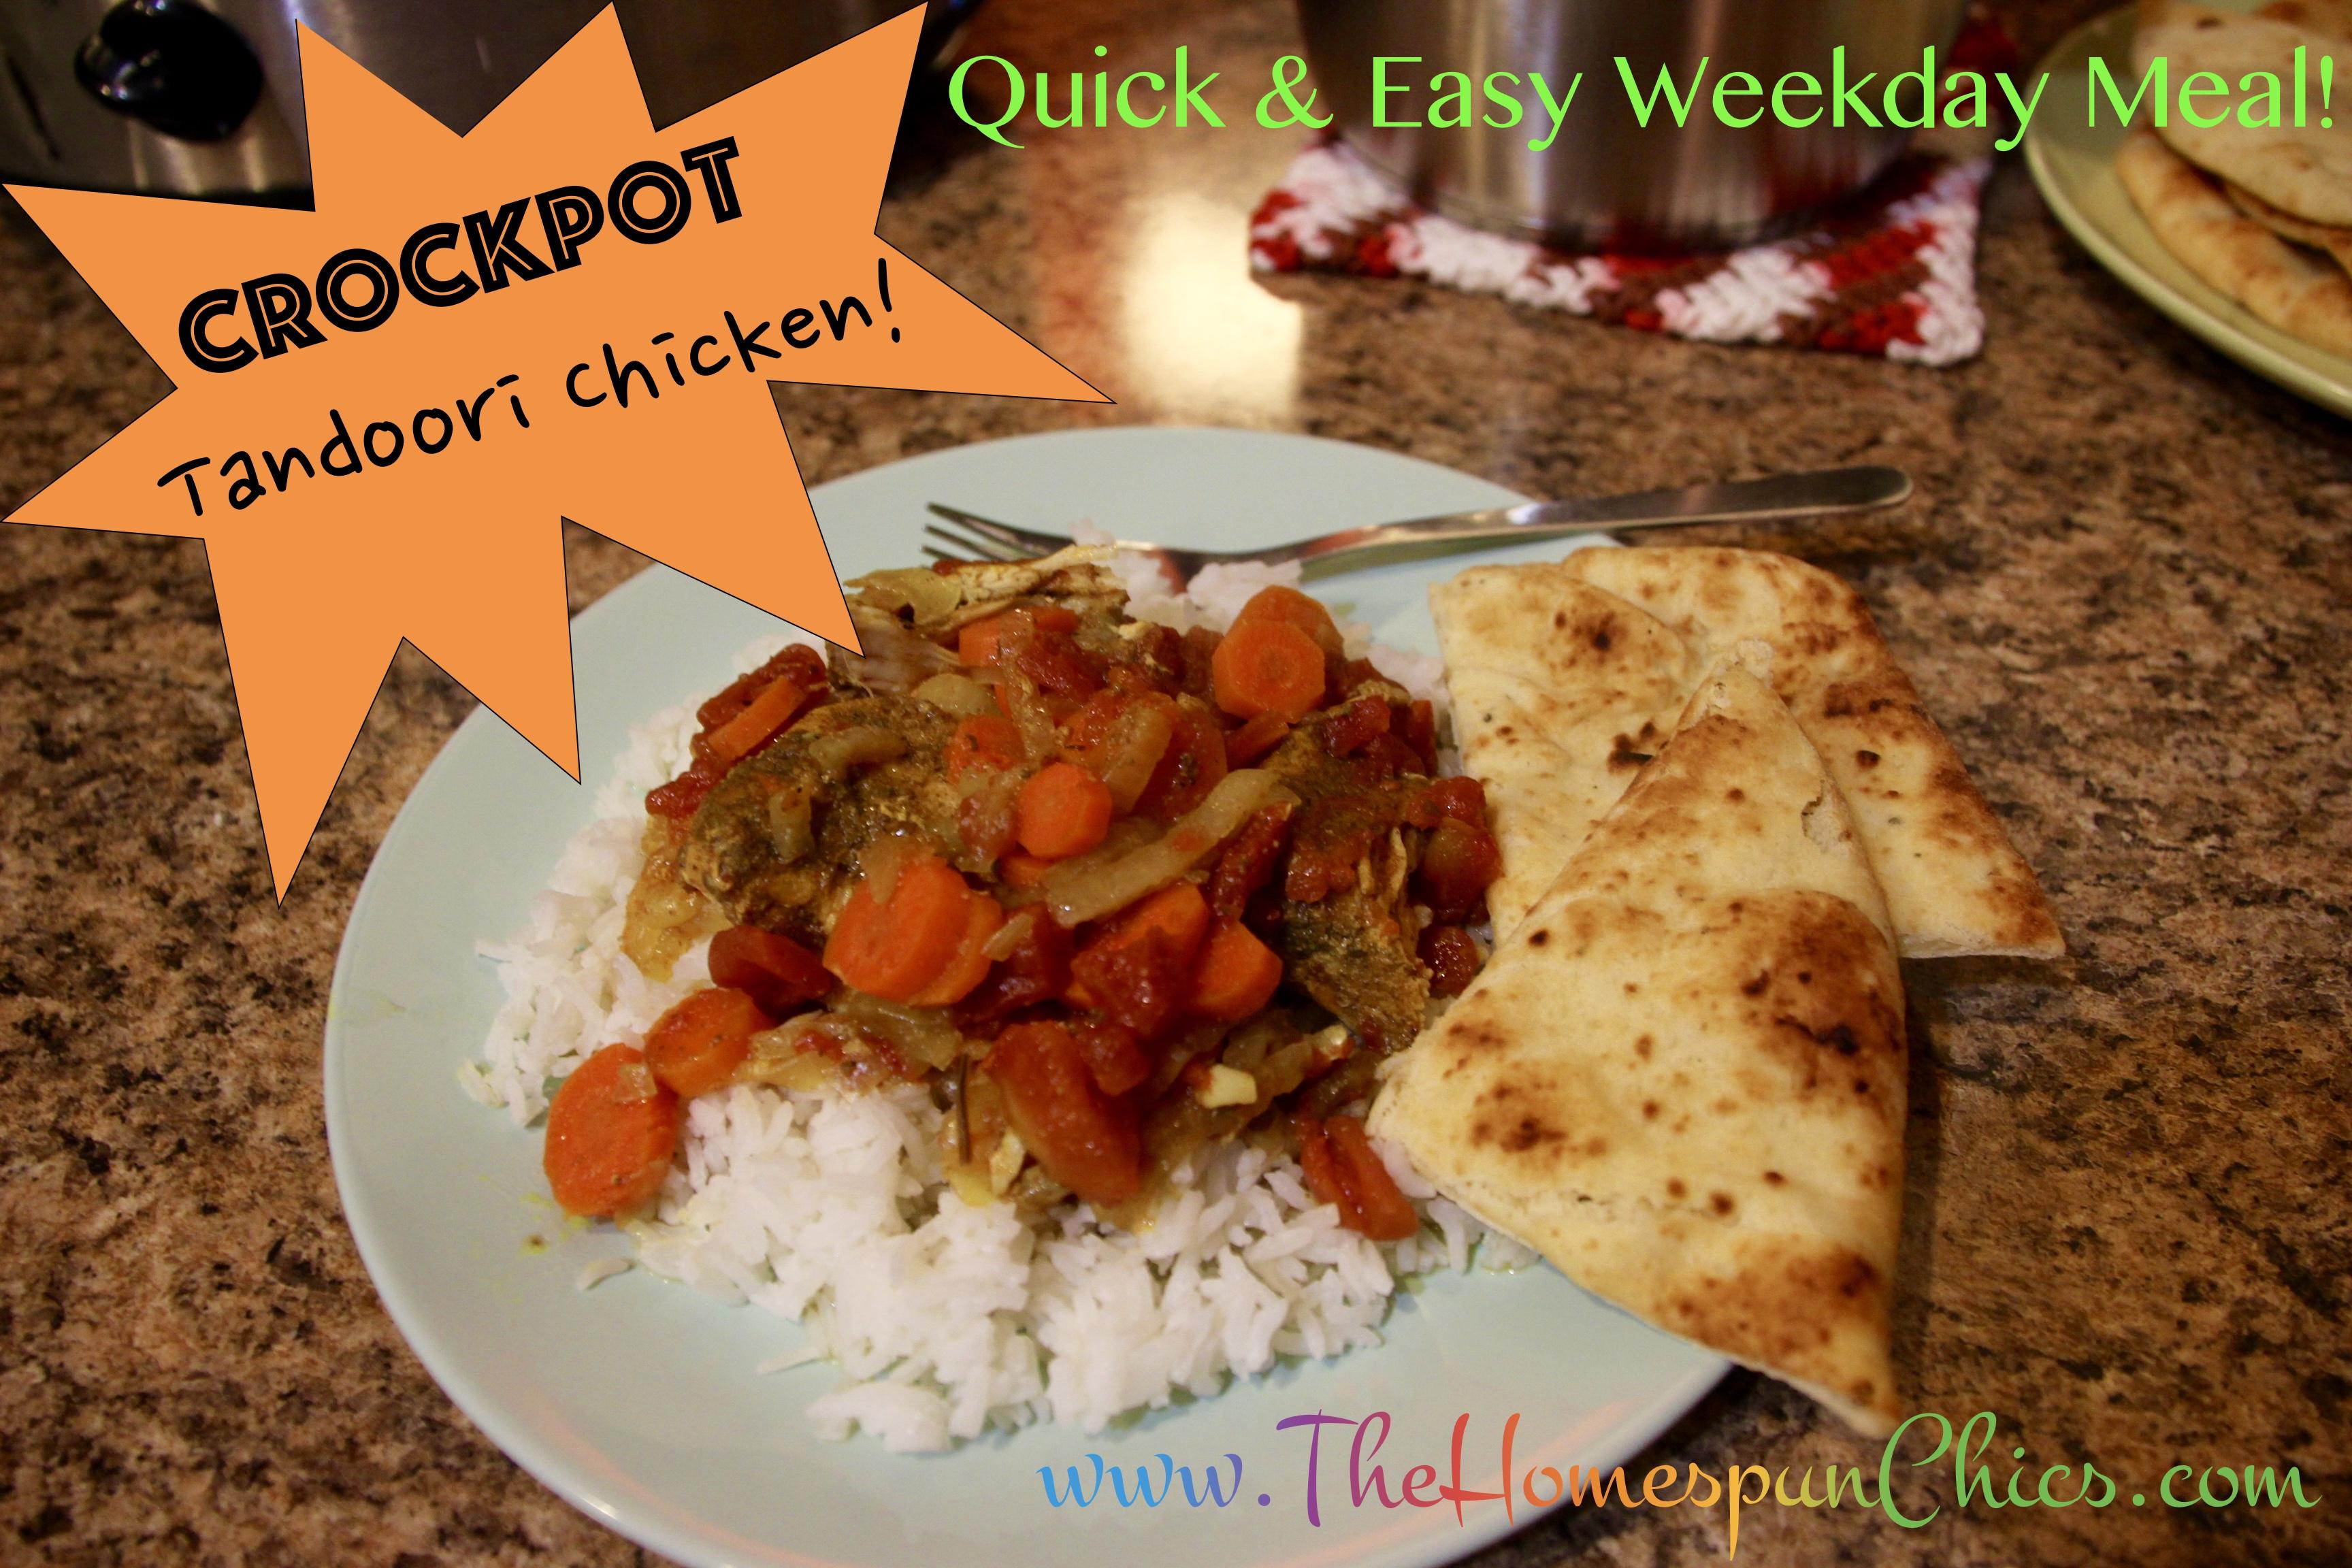 Quick Easy Crockpot Tandoori Chicken